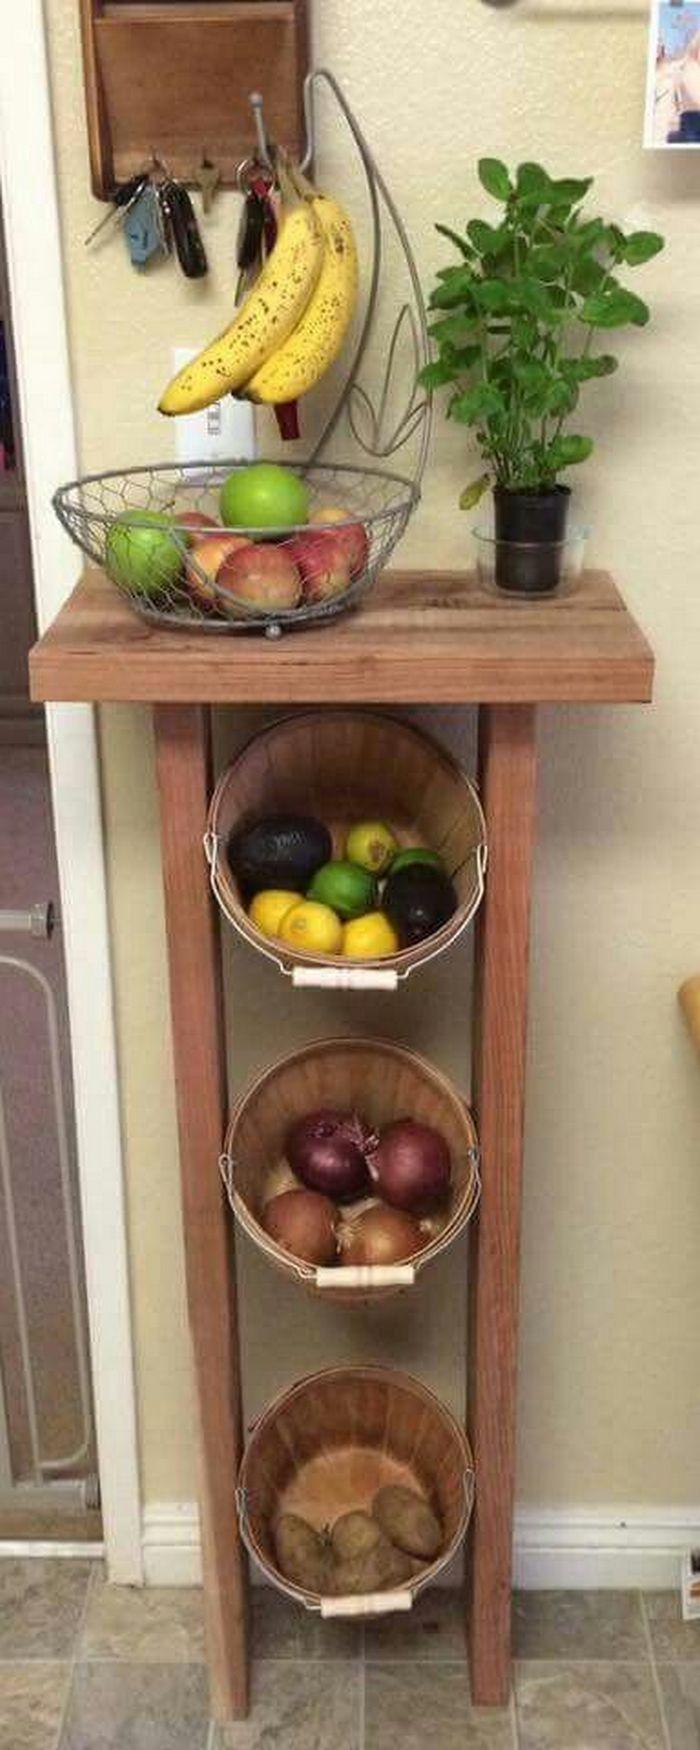 best 25 fruit storage ideas on pinterest fresh grocer produce storage and food charts. Black Bedroom Furniture Sets. Home Design Ideas